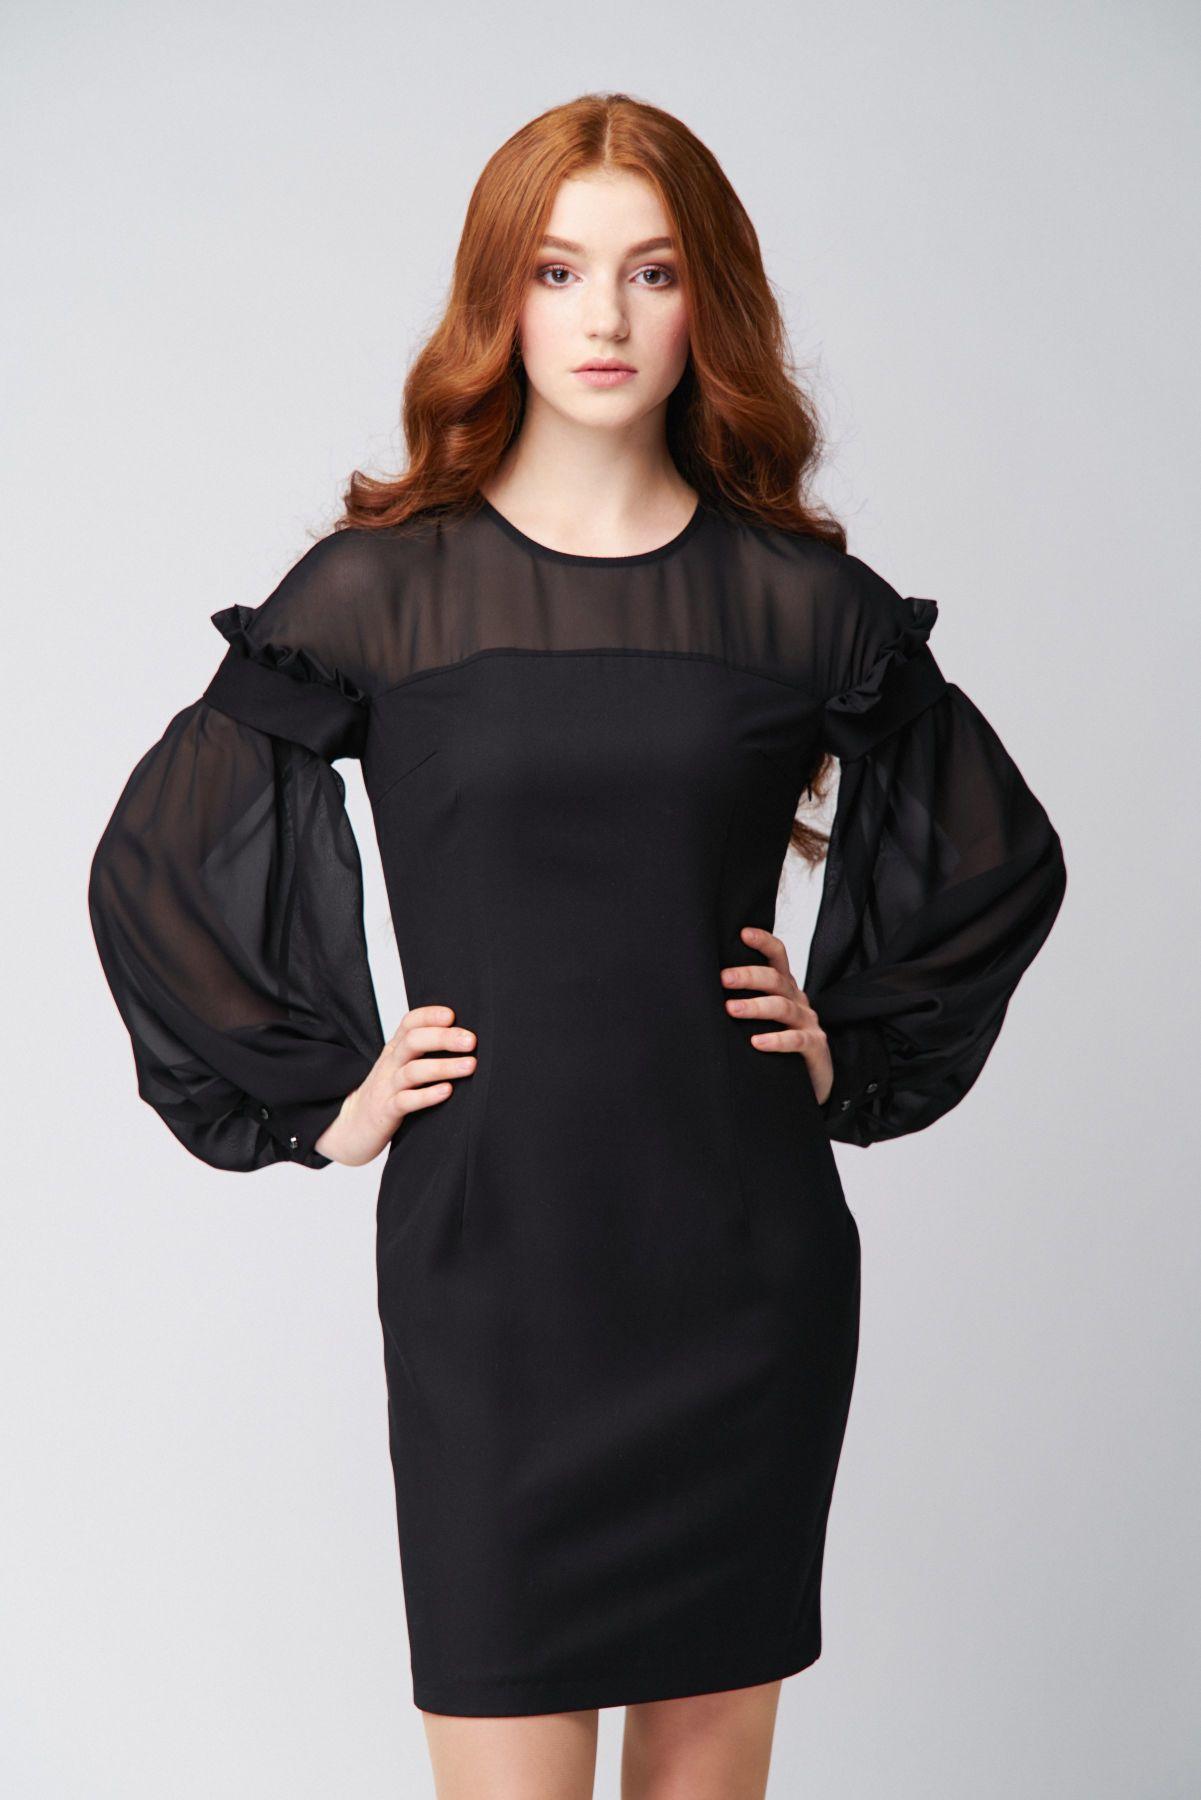 GANVERI Women's Dress with Transparent Yoke, Black image